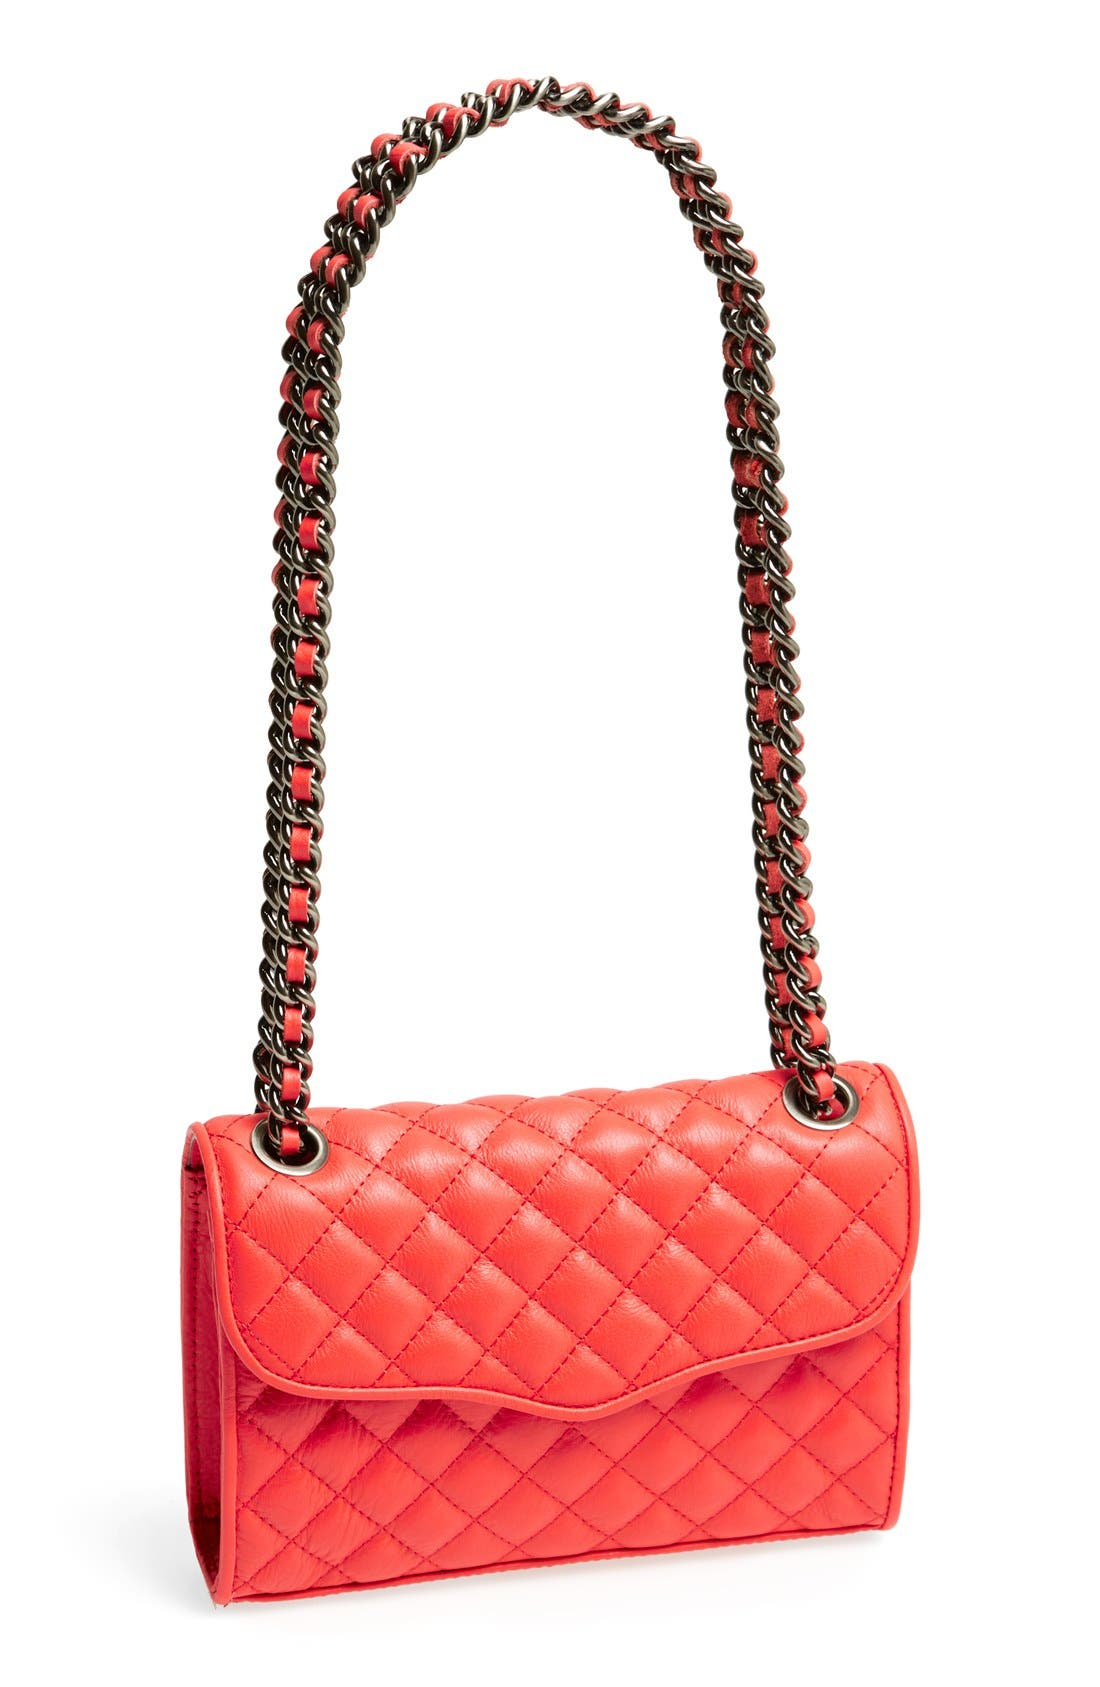 Alternate Image 1 Selected - Rebecca Minkoff 'Mini Affair' Convertible Crossbody Bag